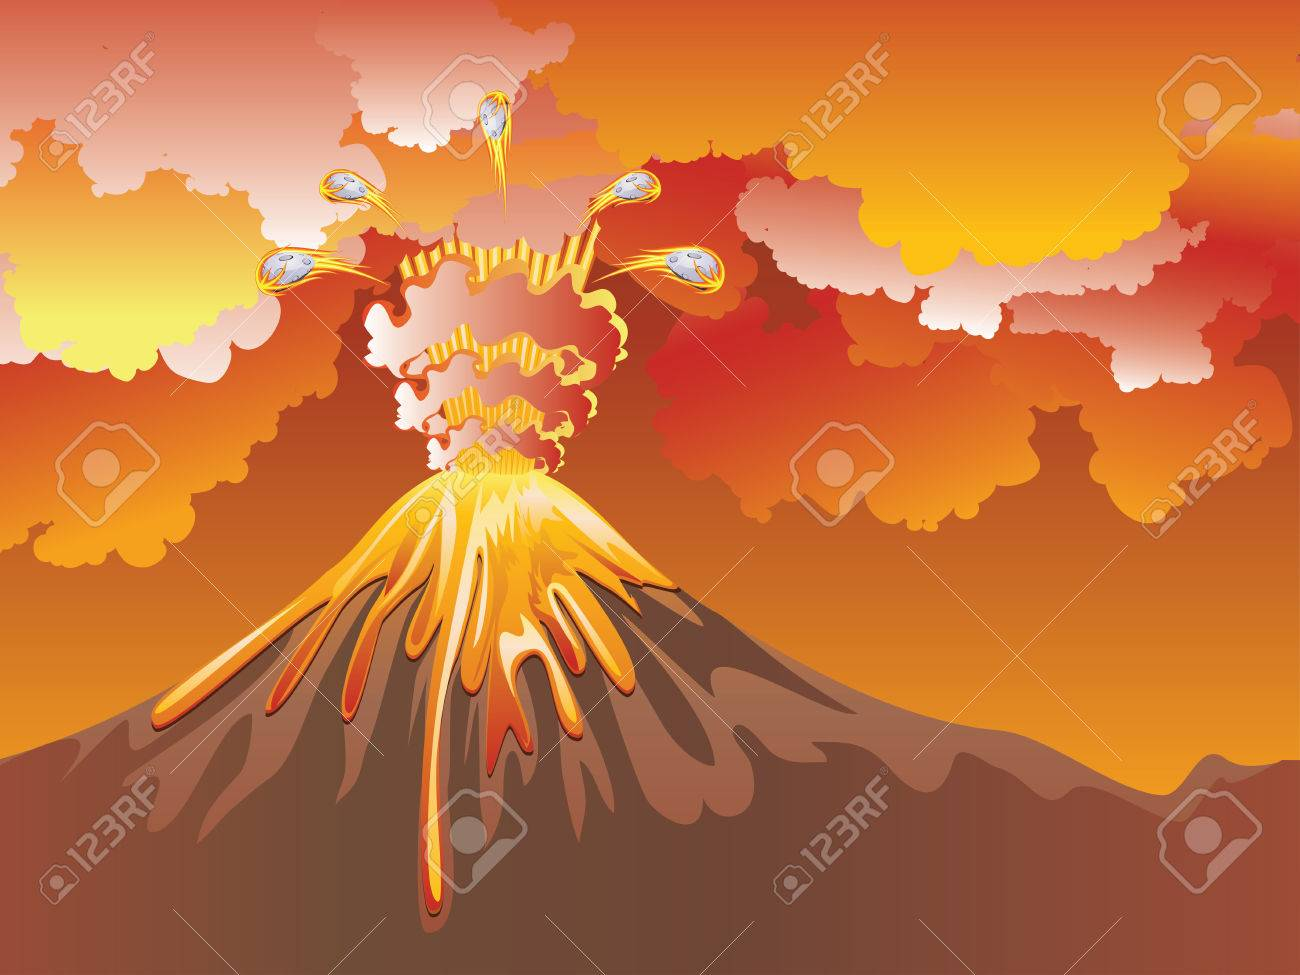 Ilustracion De La Erupcion Del Volcan Del Dibujo Animado Con La Lava